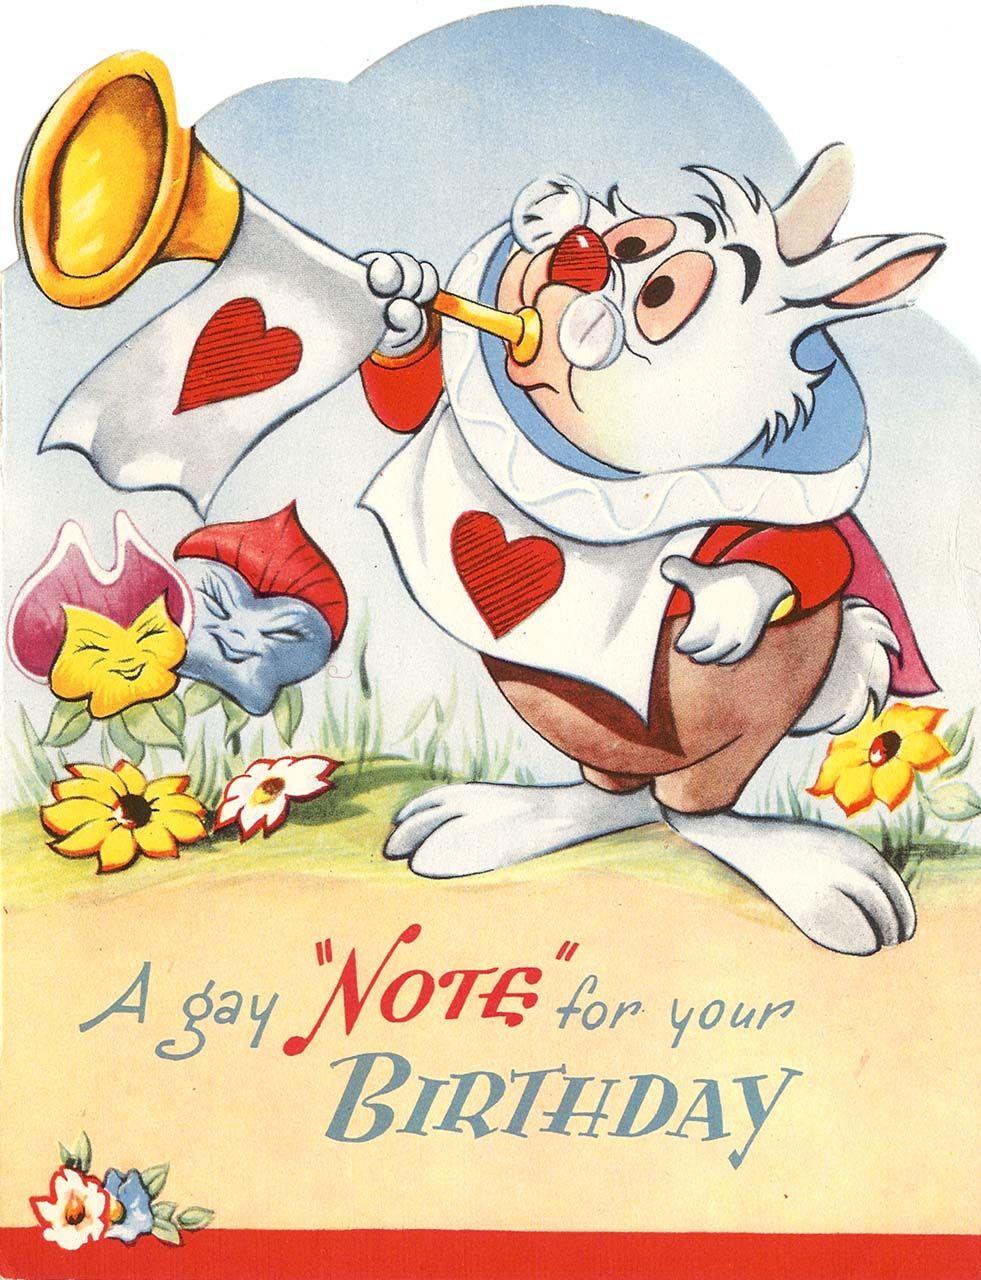 Wallpaper iphone alice wonderland - Wallpaper Iphone Disney Vintage Disney Alice English Birthday Card By Valentine S White